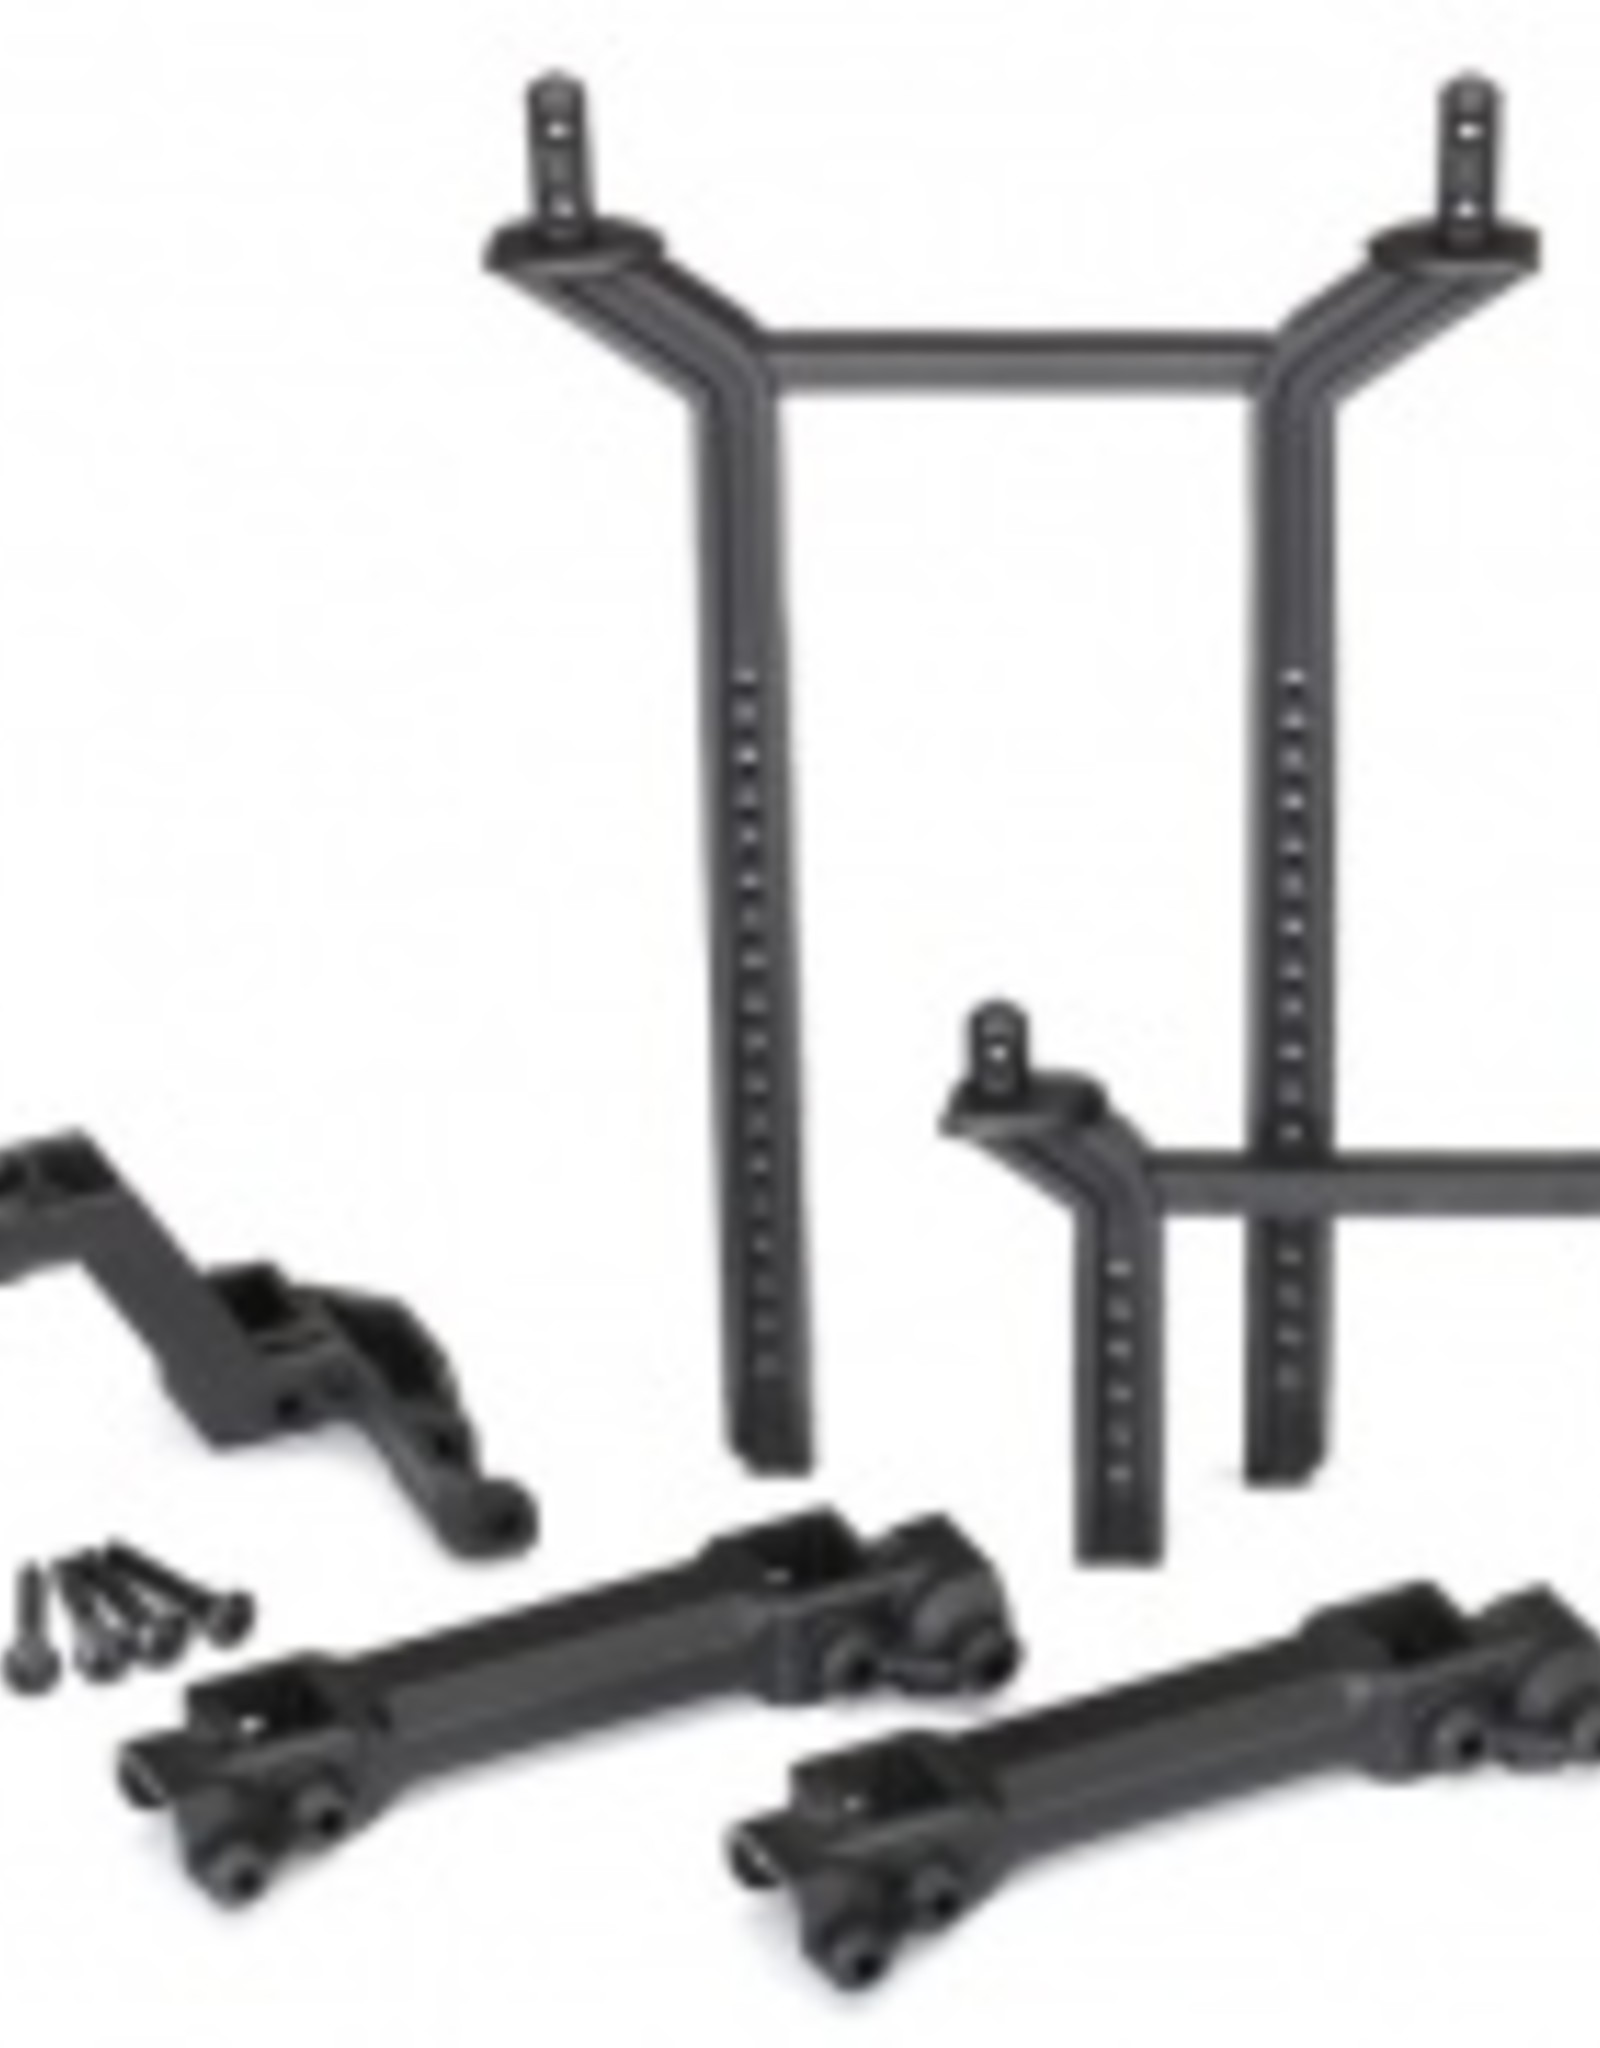 Traxxas Traxxas TRX Body mounts & posts, front & rear (complete set)